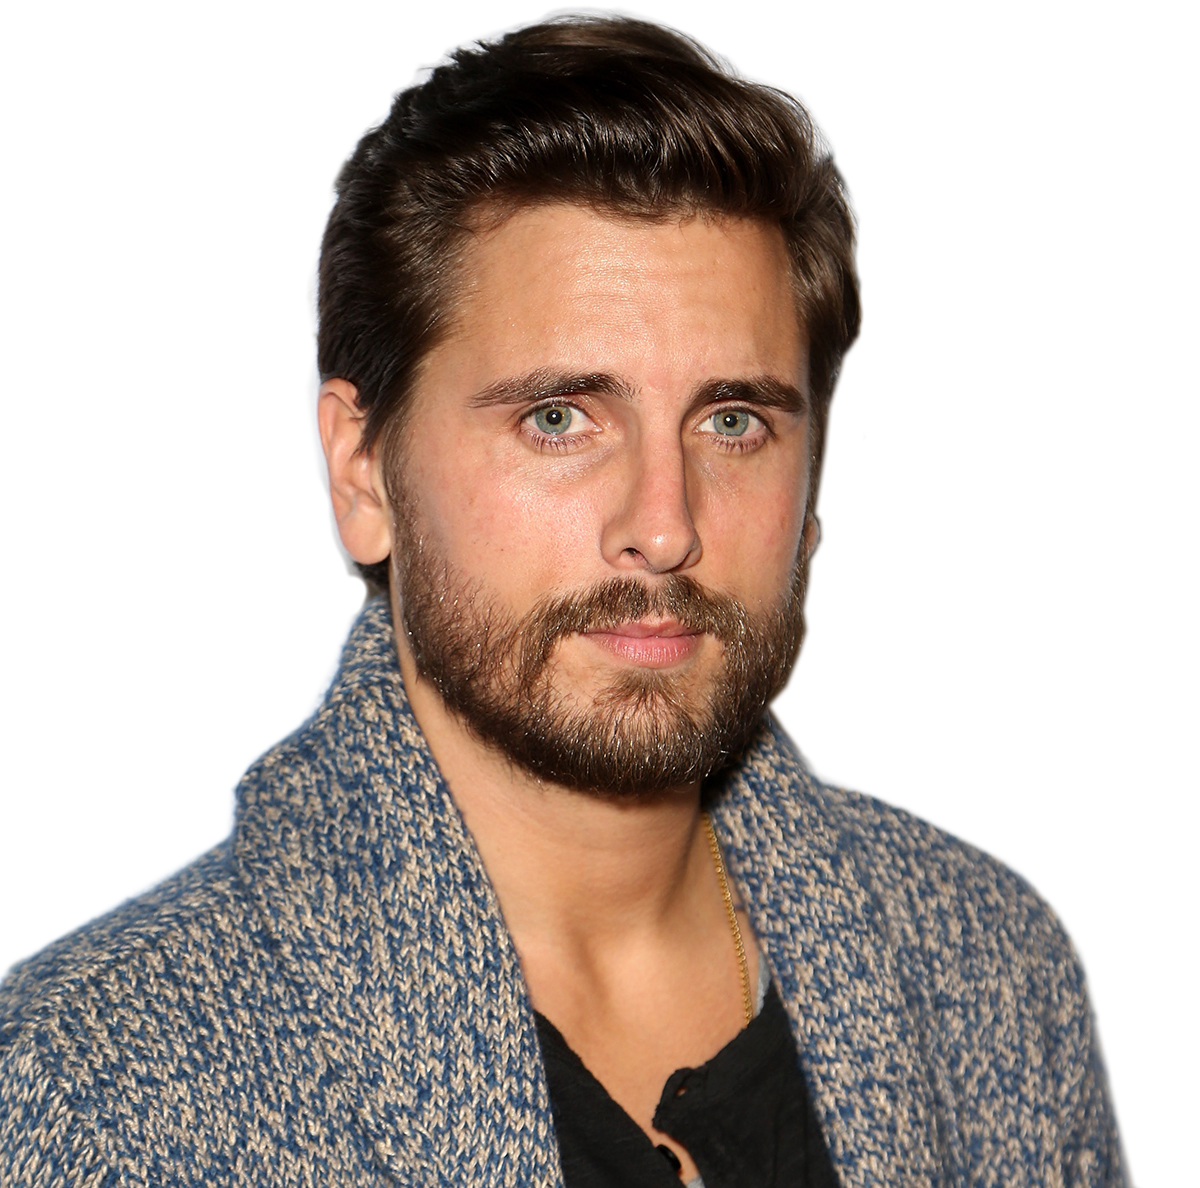 TV personality Scott Disick - age: 38